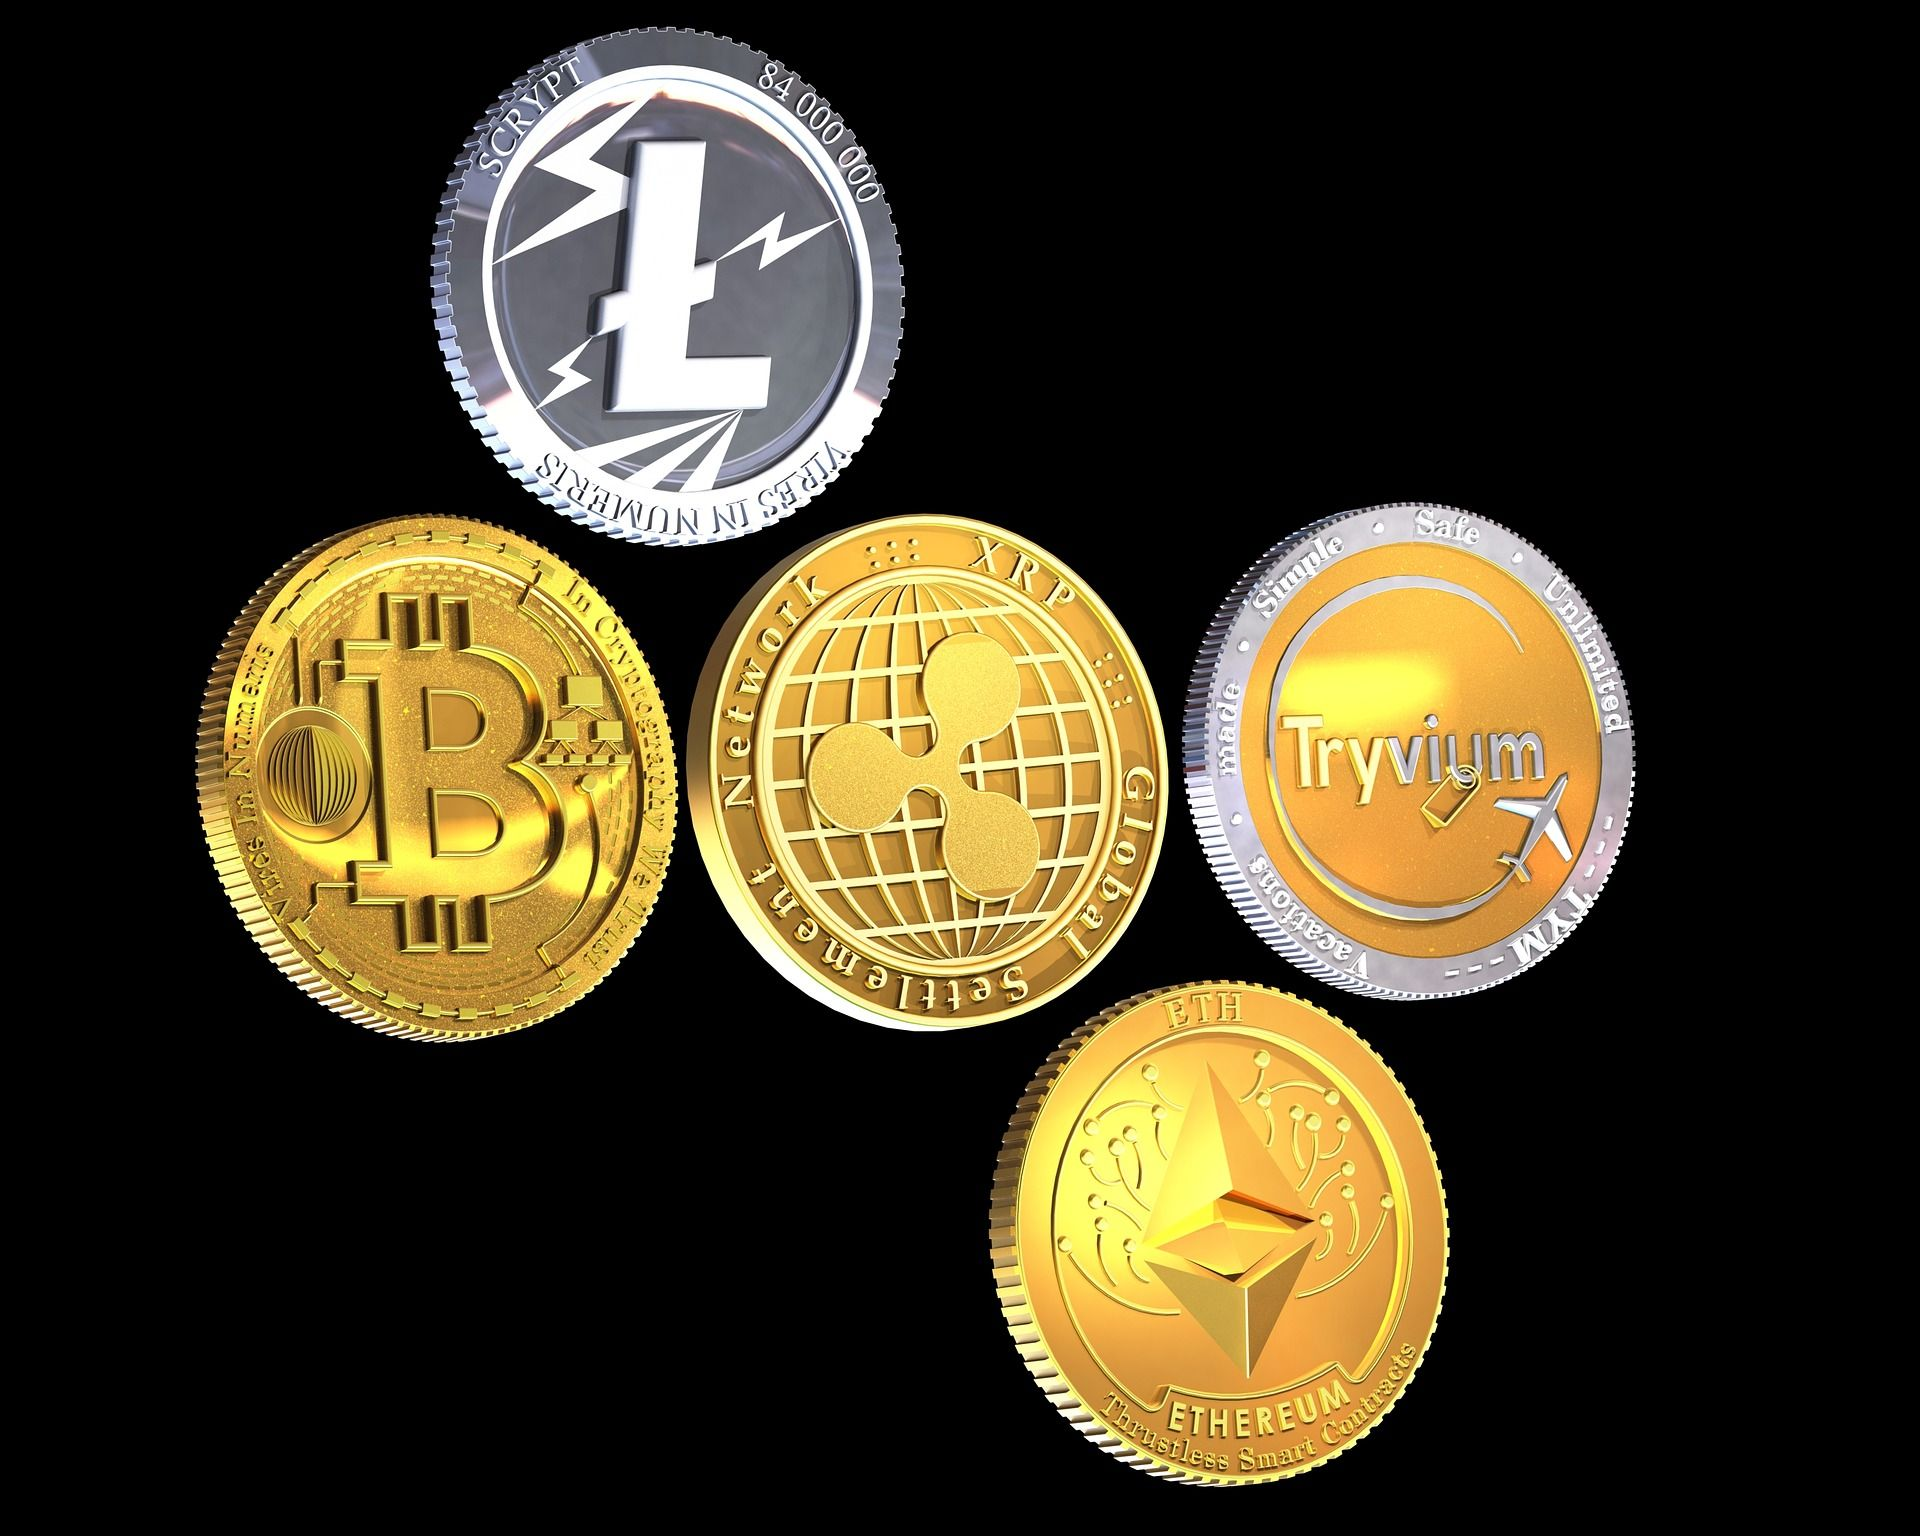 selfmade millionär deutsch bitcoin strongest currency